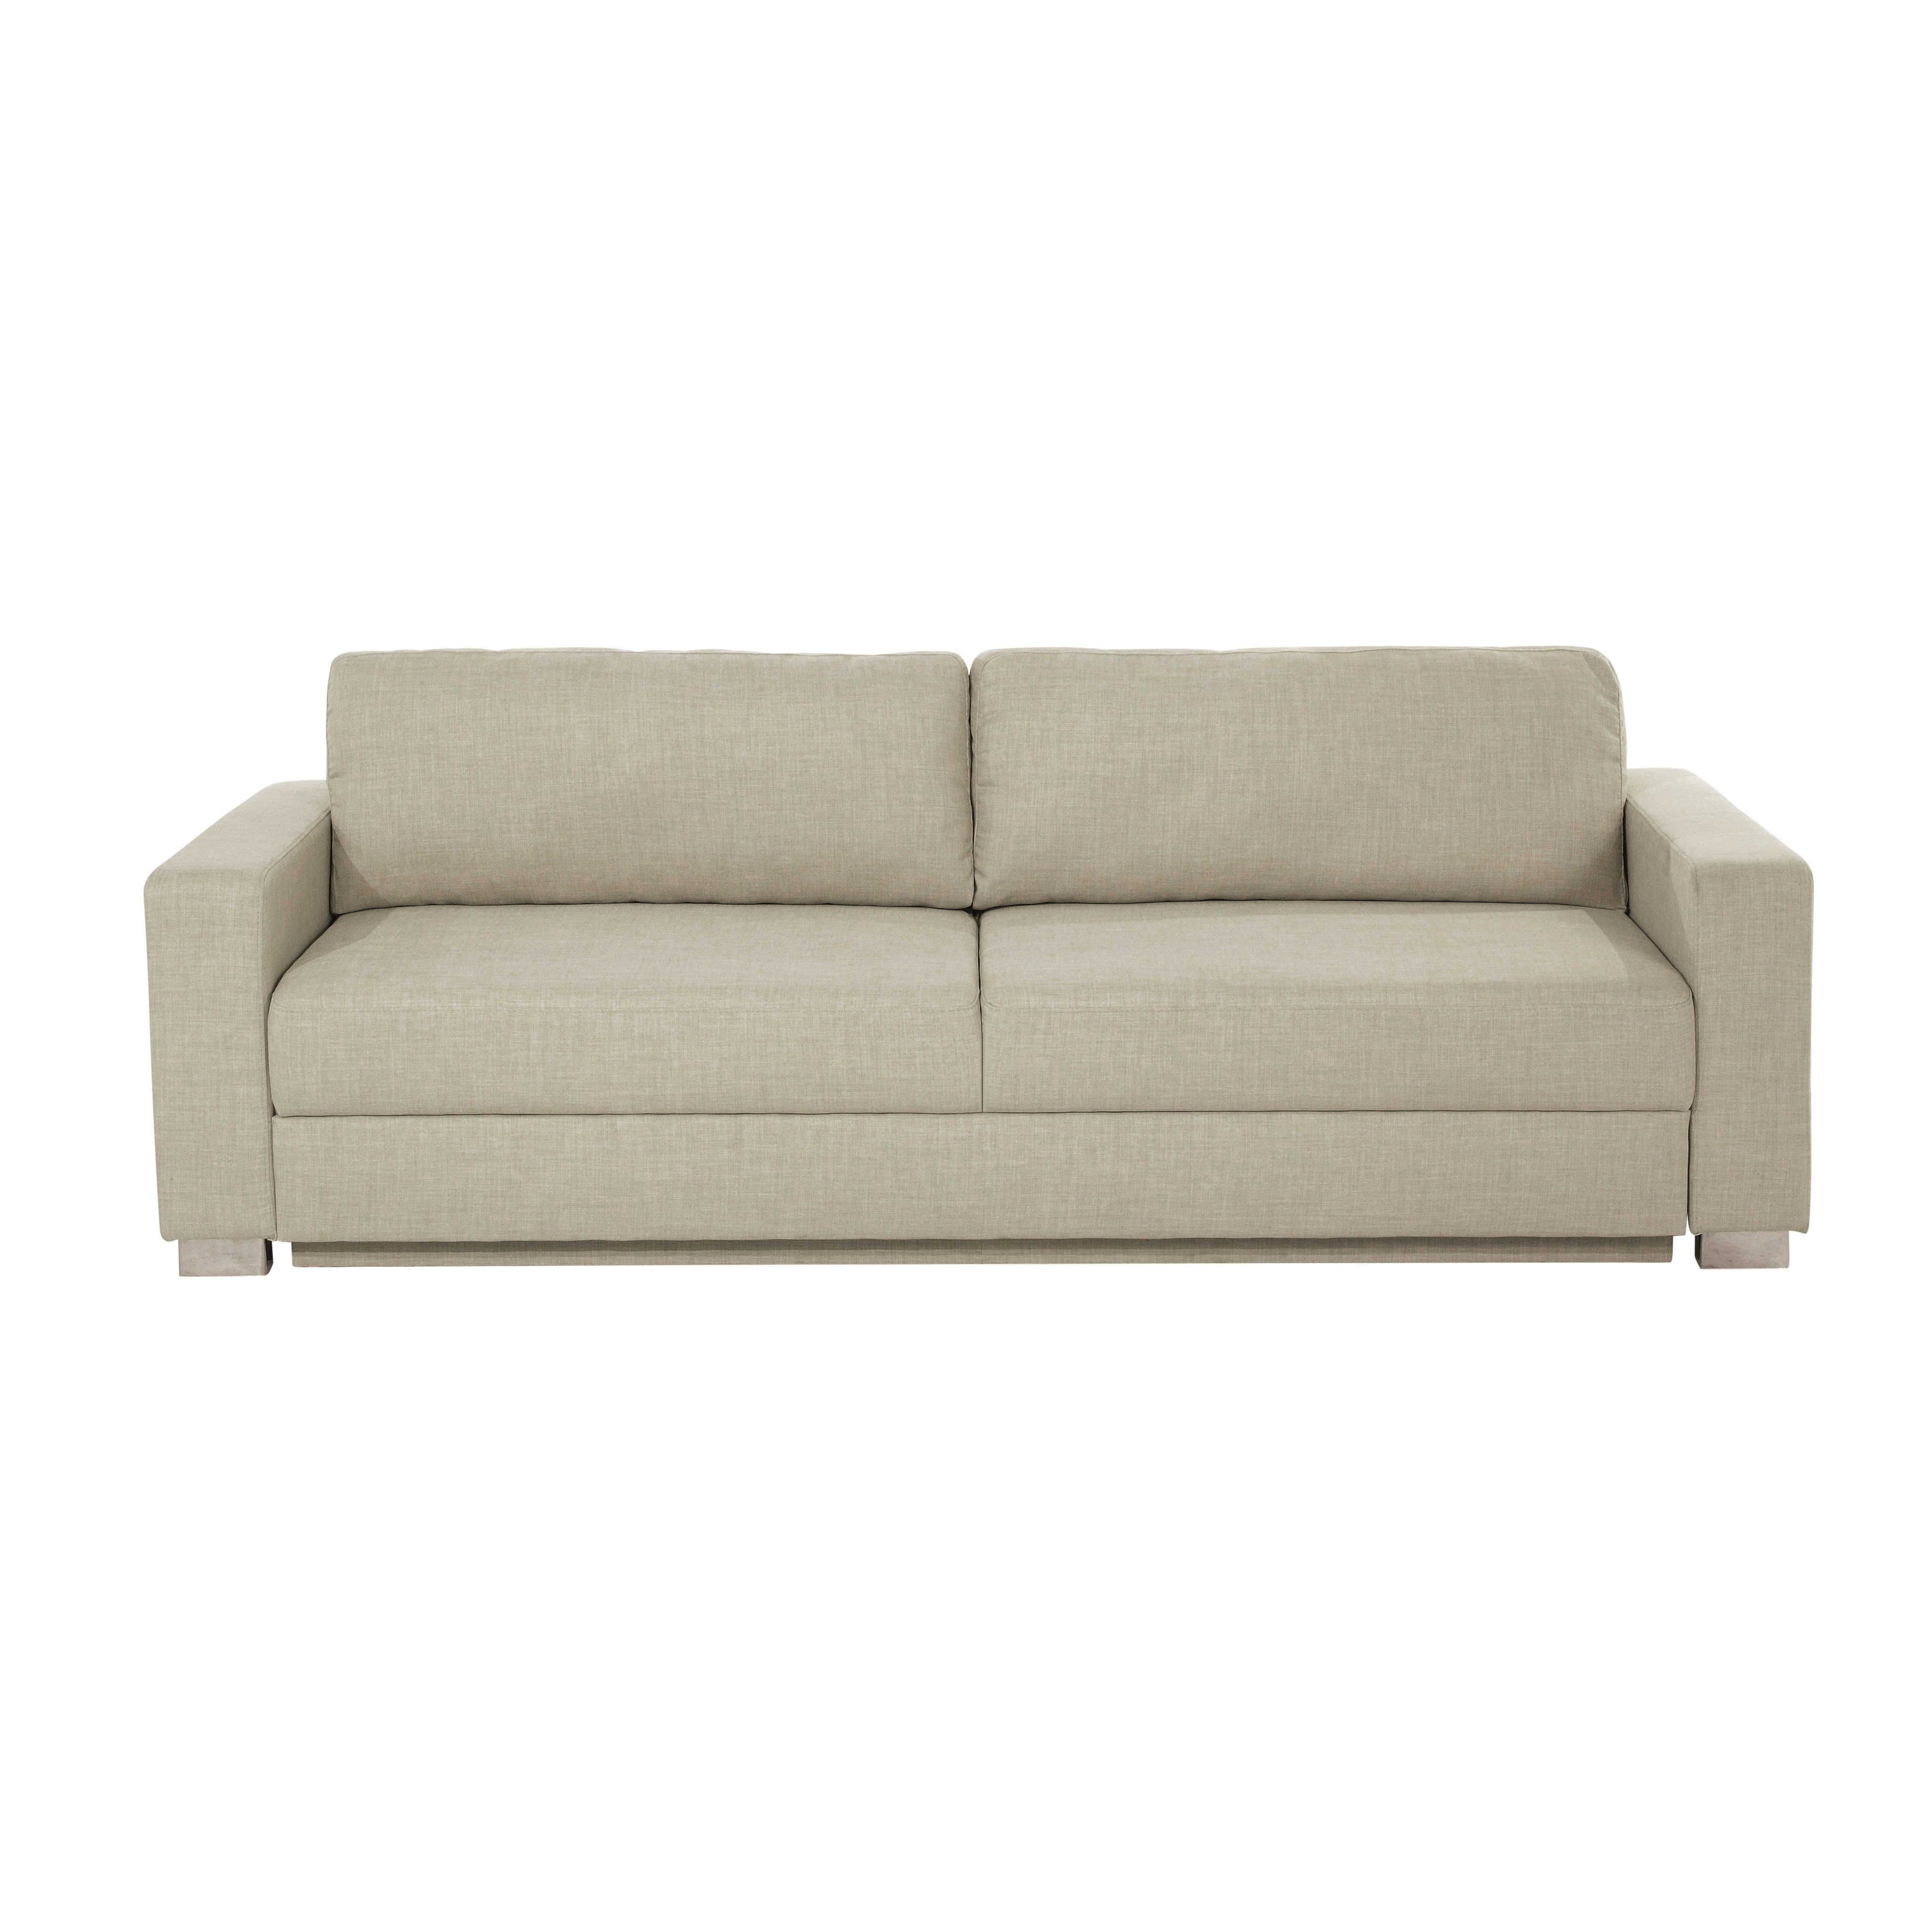 Canapés Droits   Sofa, Beige, Convertible intérieur Canape Beige Convertible